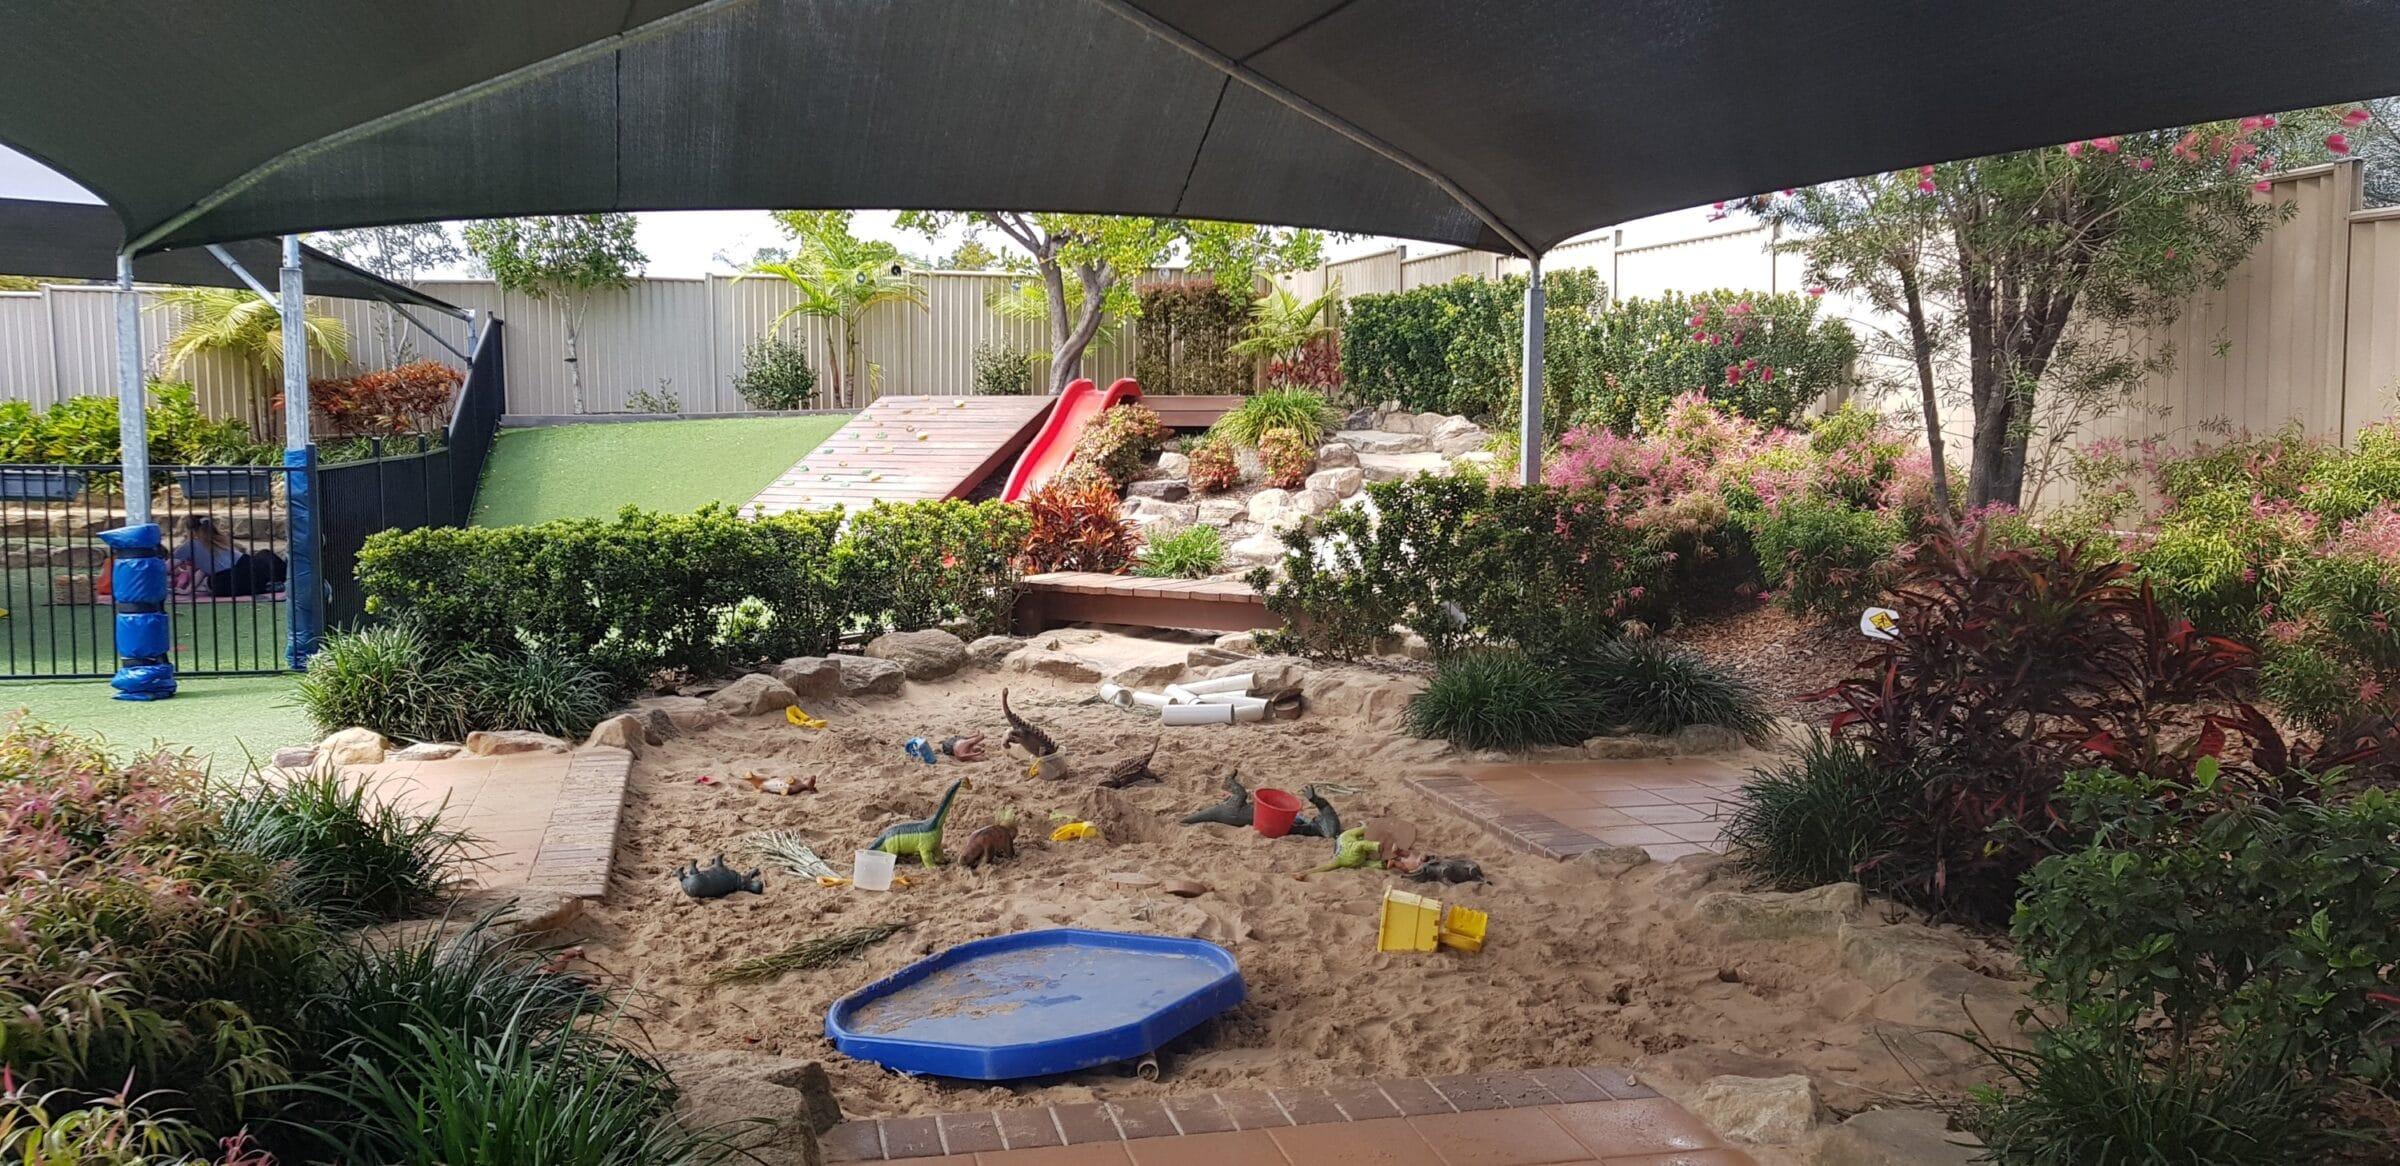 Goodstart ELC Mooney Beach Exciting Sydney Playgrounds Design - Pleasantview Industries